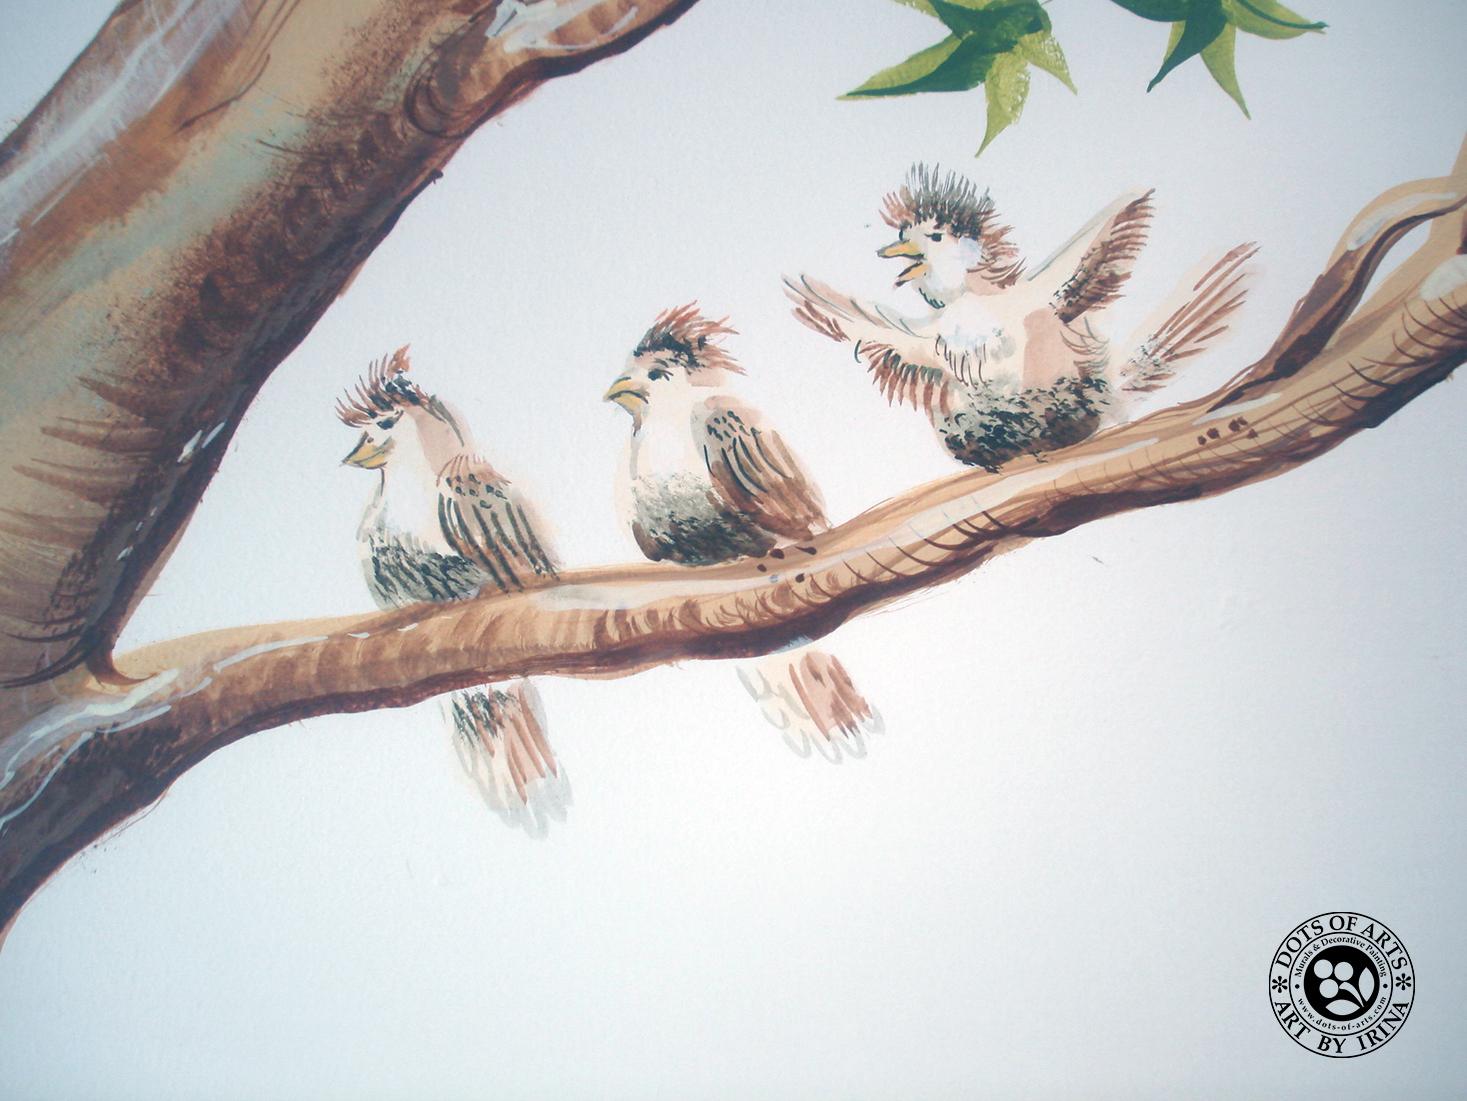 mural-custom-wall-commercial-kidz-kuts-woodbridge-nj-dots-of-arts-tree-sparrow.jpg